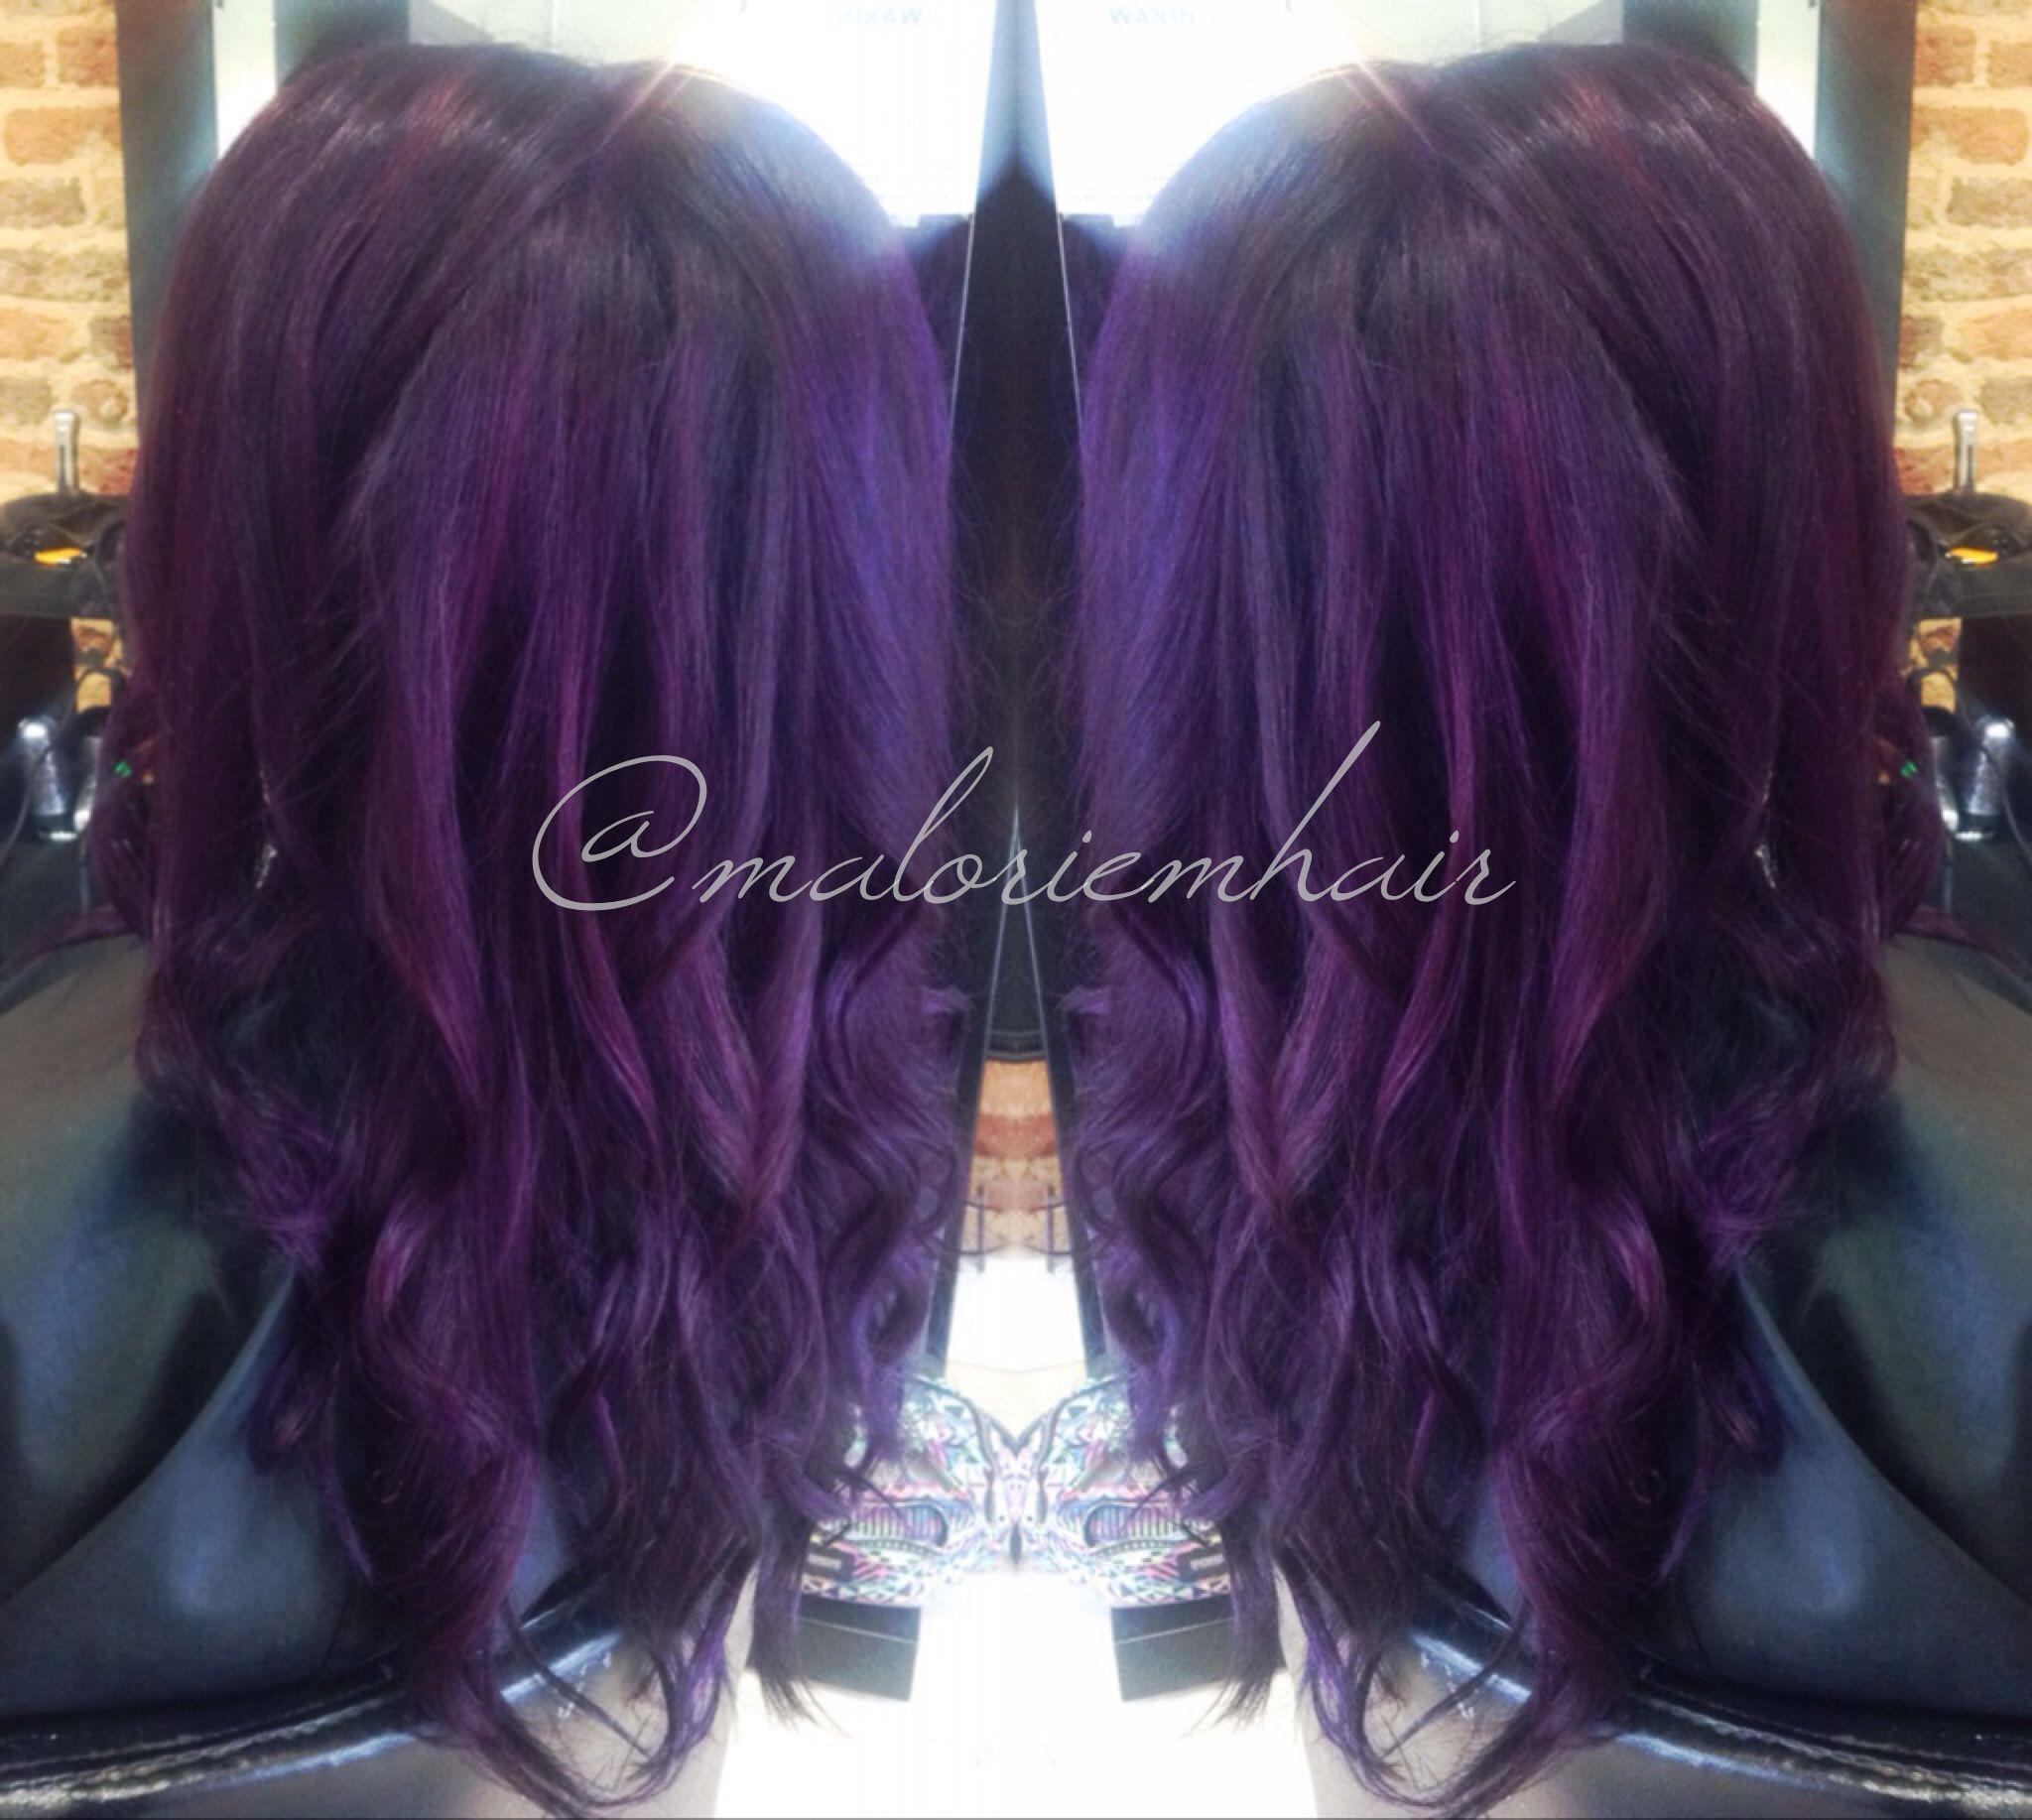 Purple Hair Formula Pravana Vivids Violet Wild Orchid Check Out My Instagram Maloriemhair Hair Inspiration Color Hair Styles Hair Color Images